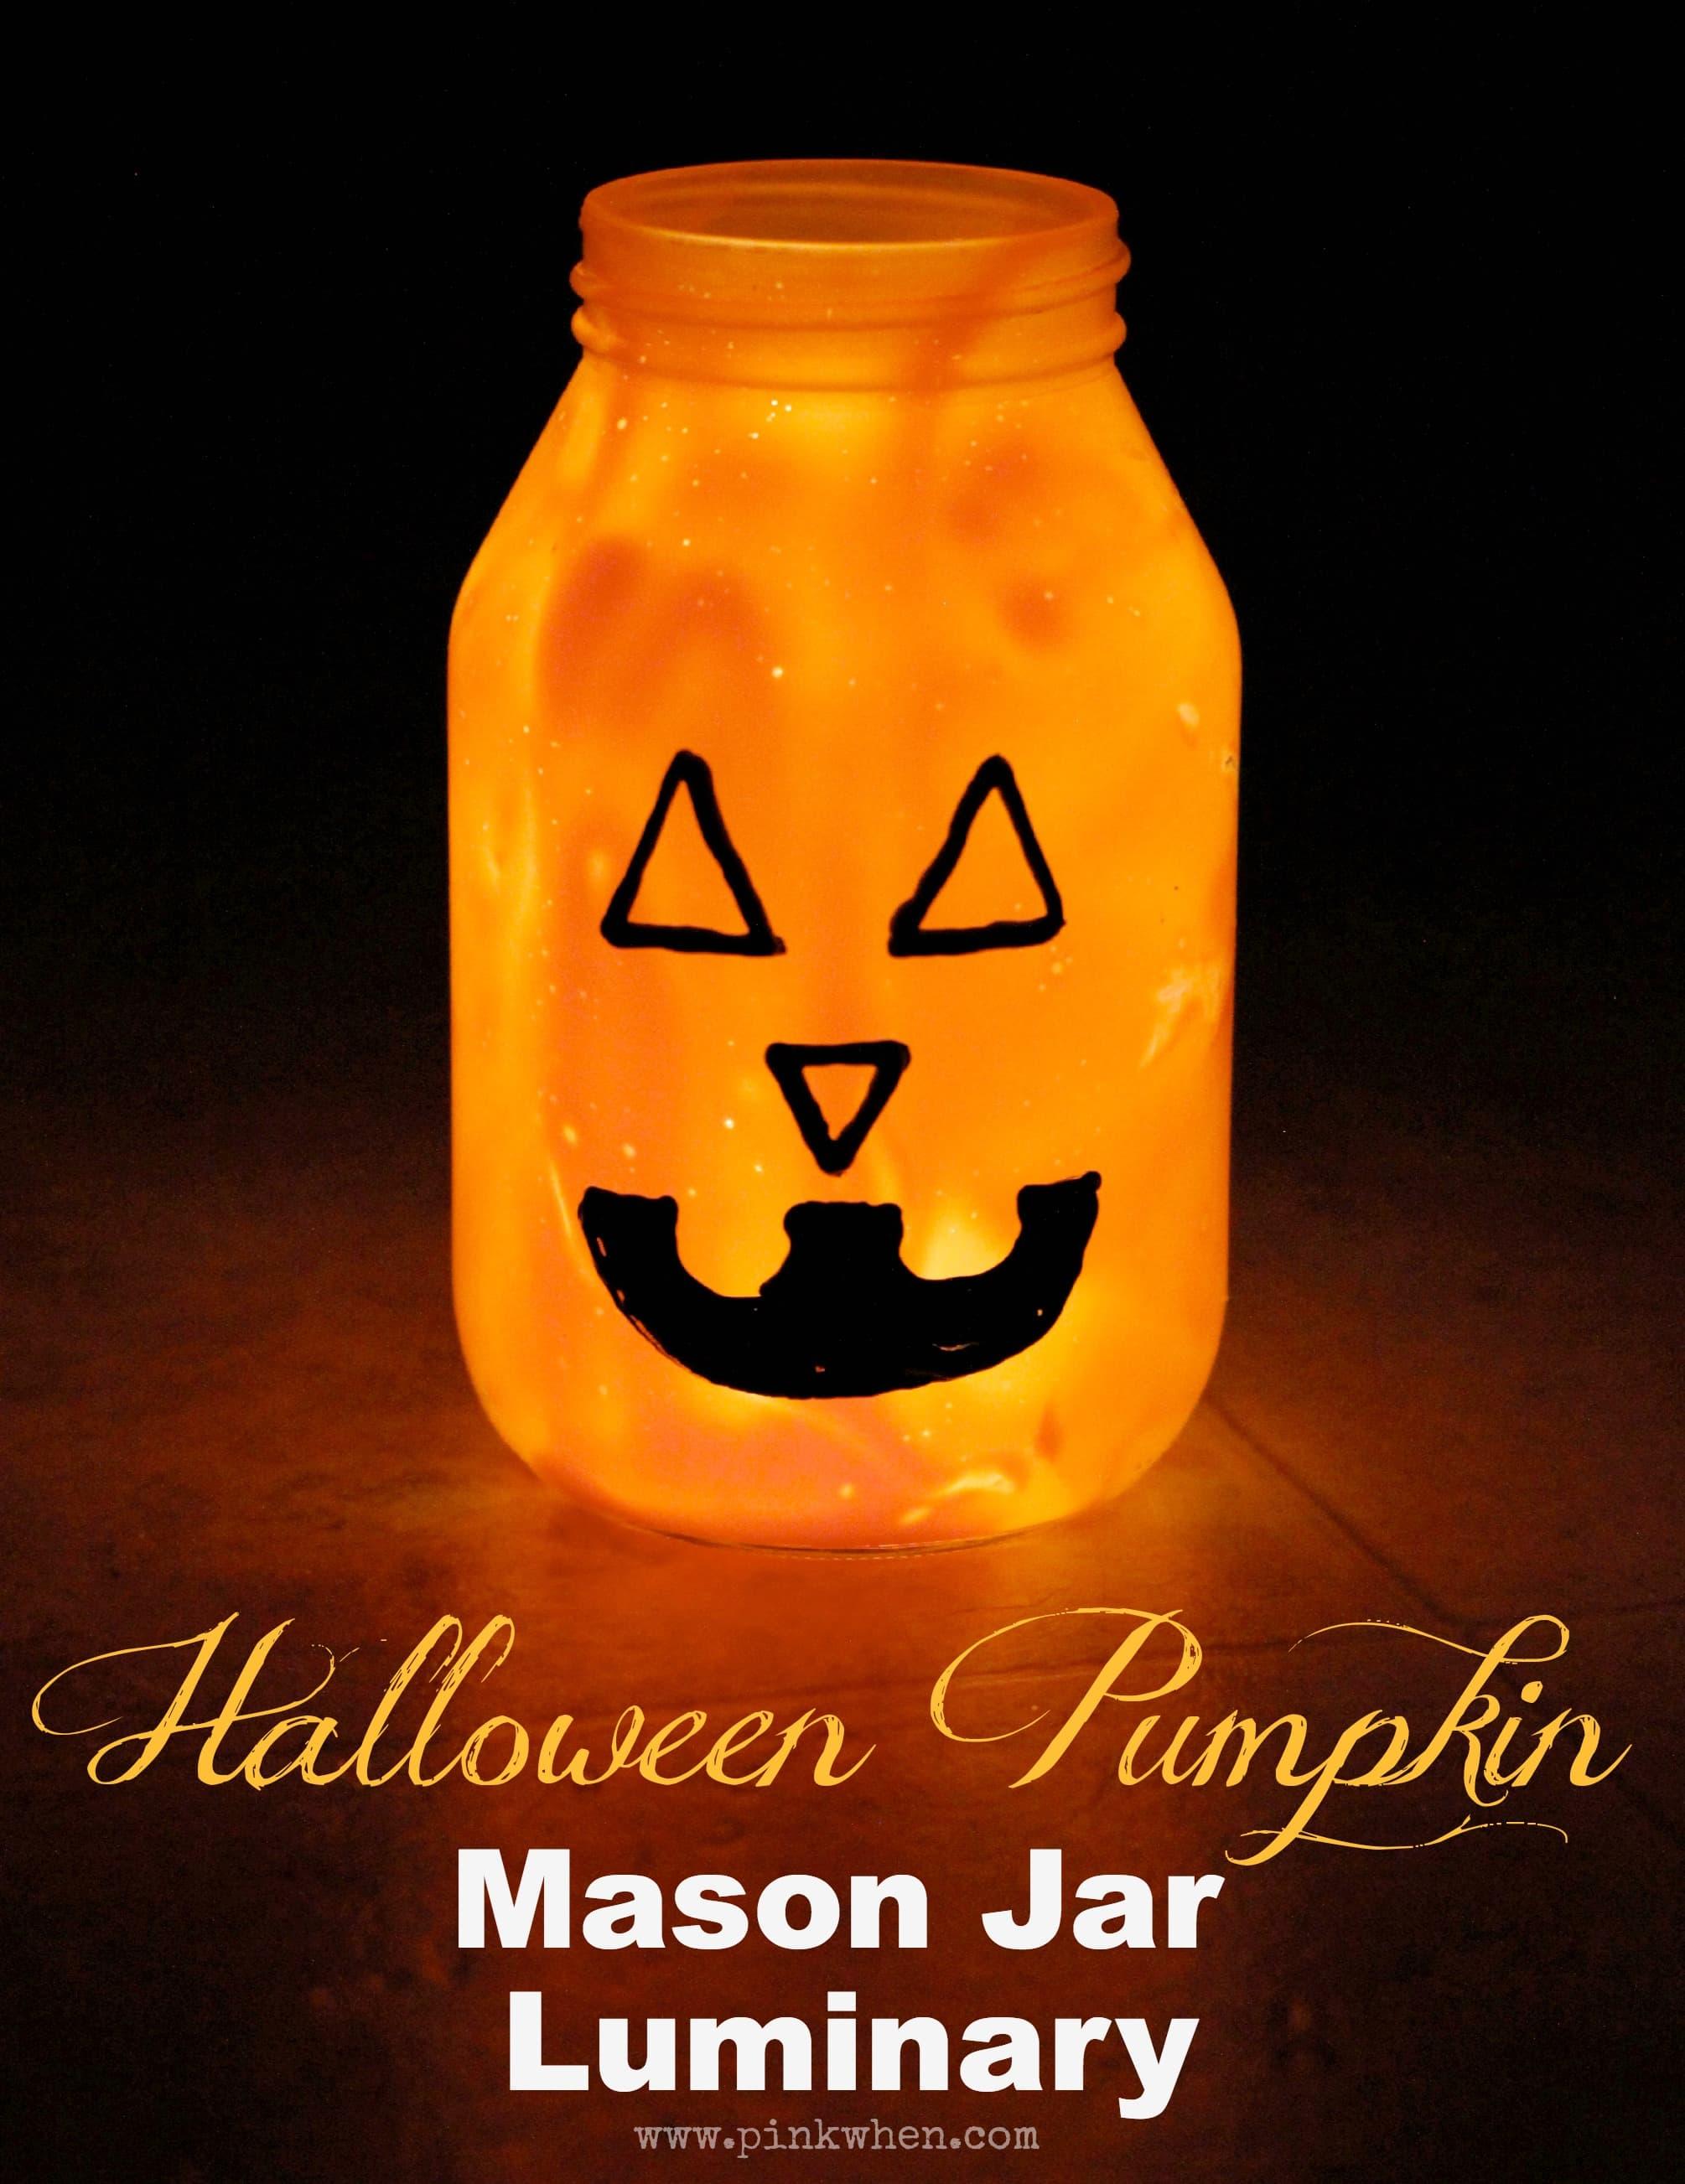 Pumpkin Mason Jar Luminary PinkWhen